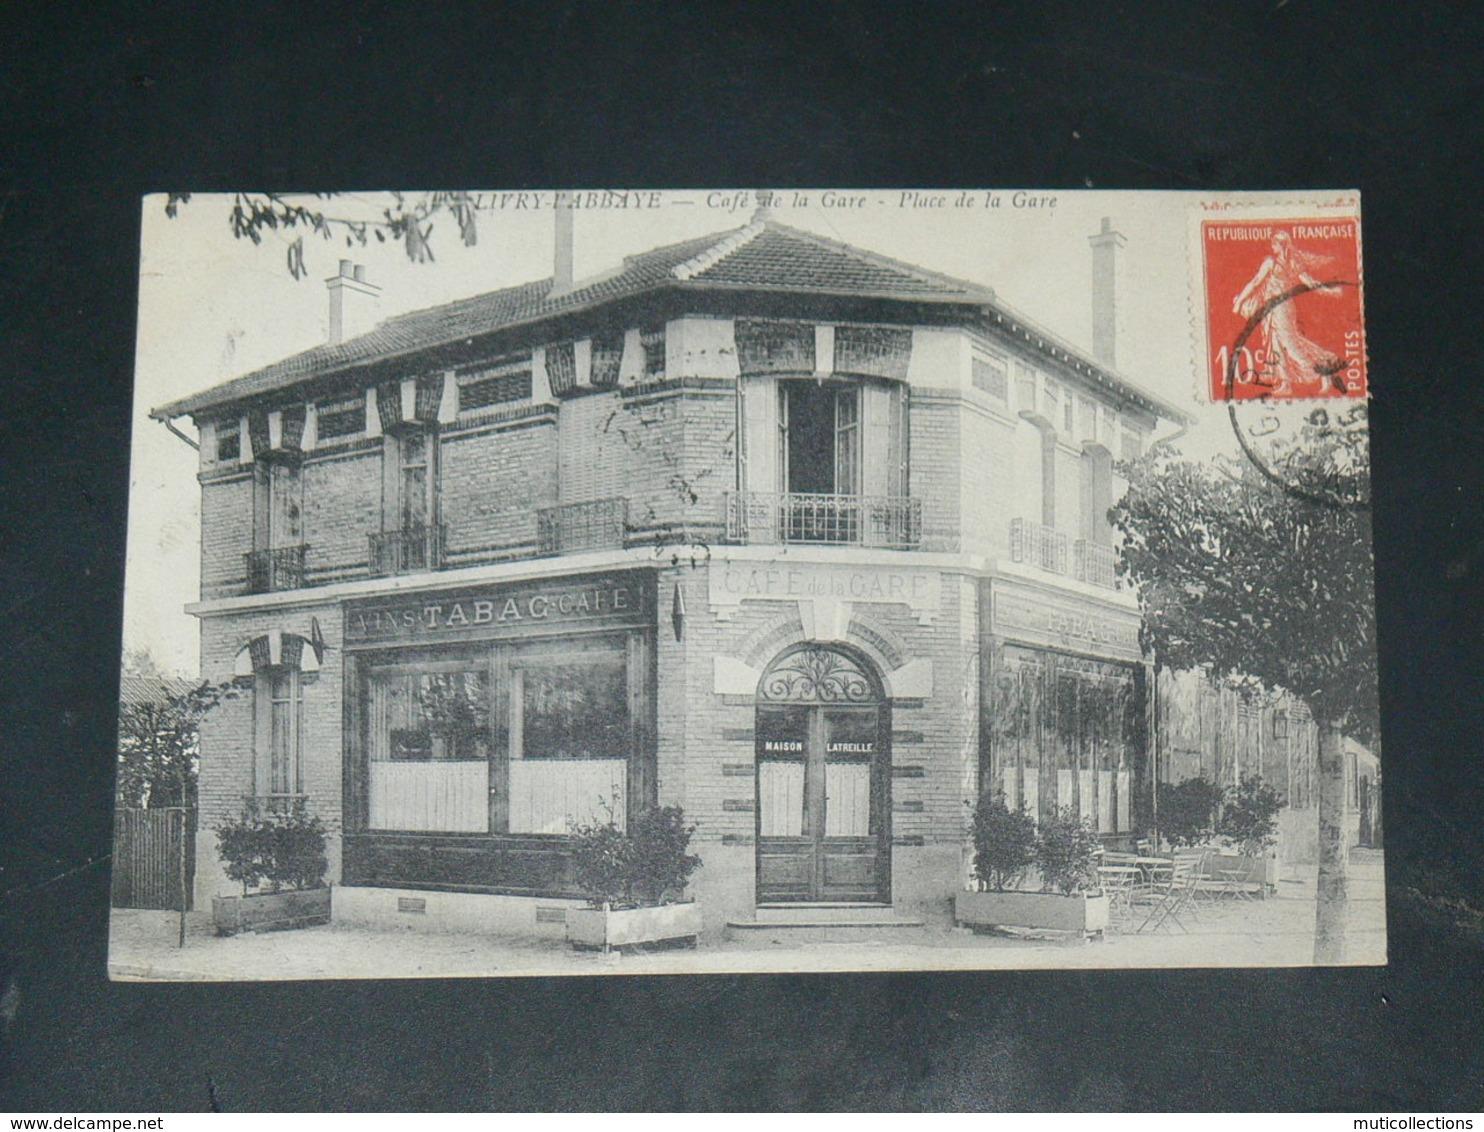 LIVRY  GARGAN / LIVRY L ABBAYE  1910 /   VUE DEVANTURE COMMERCE CAFE DE LA GARE    ....  EDITEUR - Livry Gargan